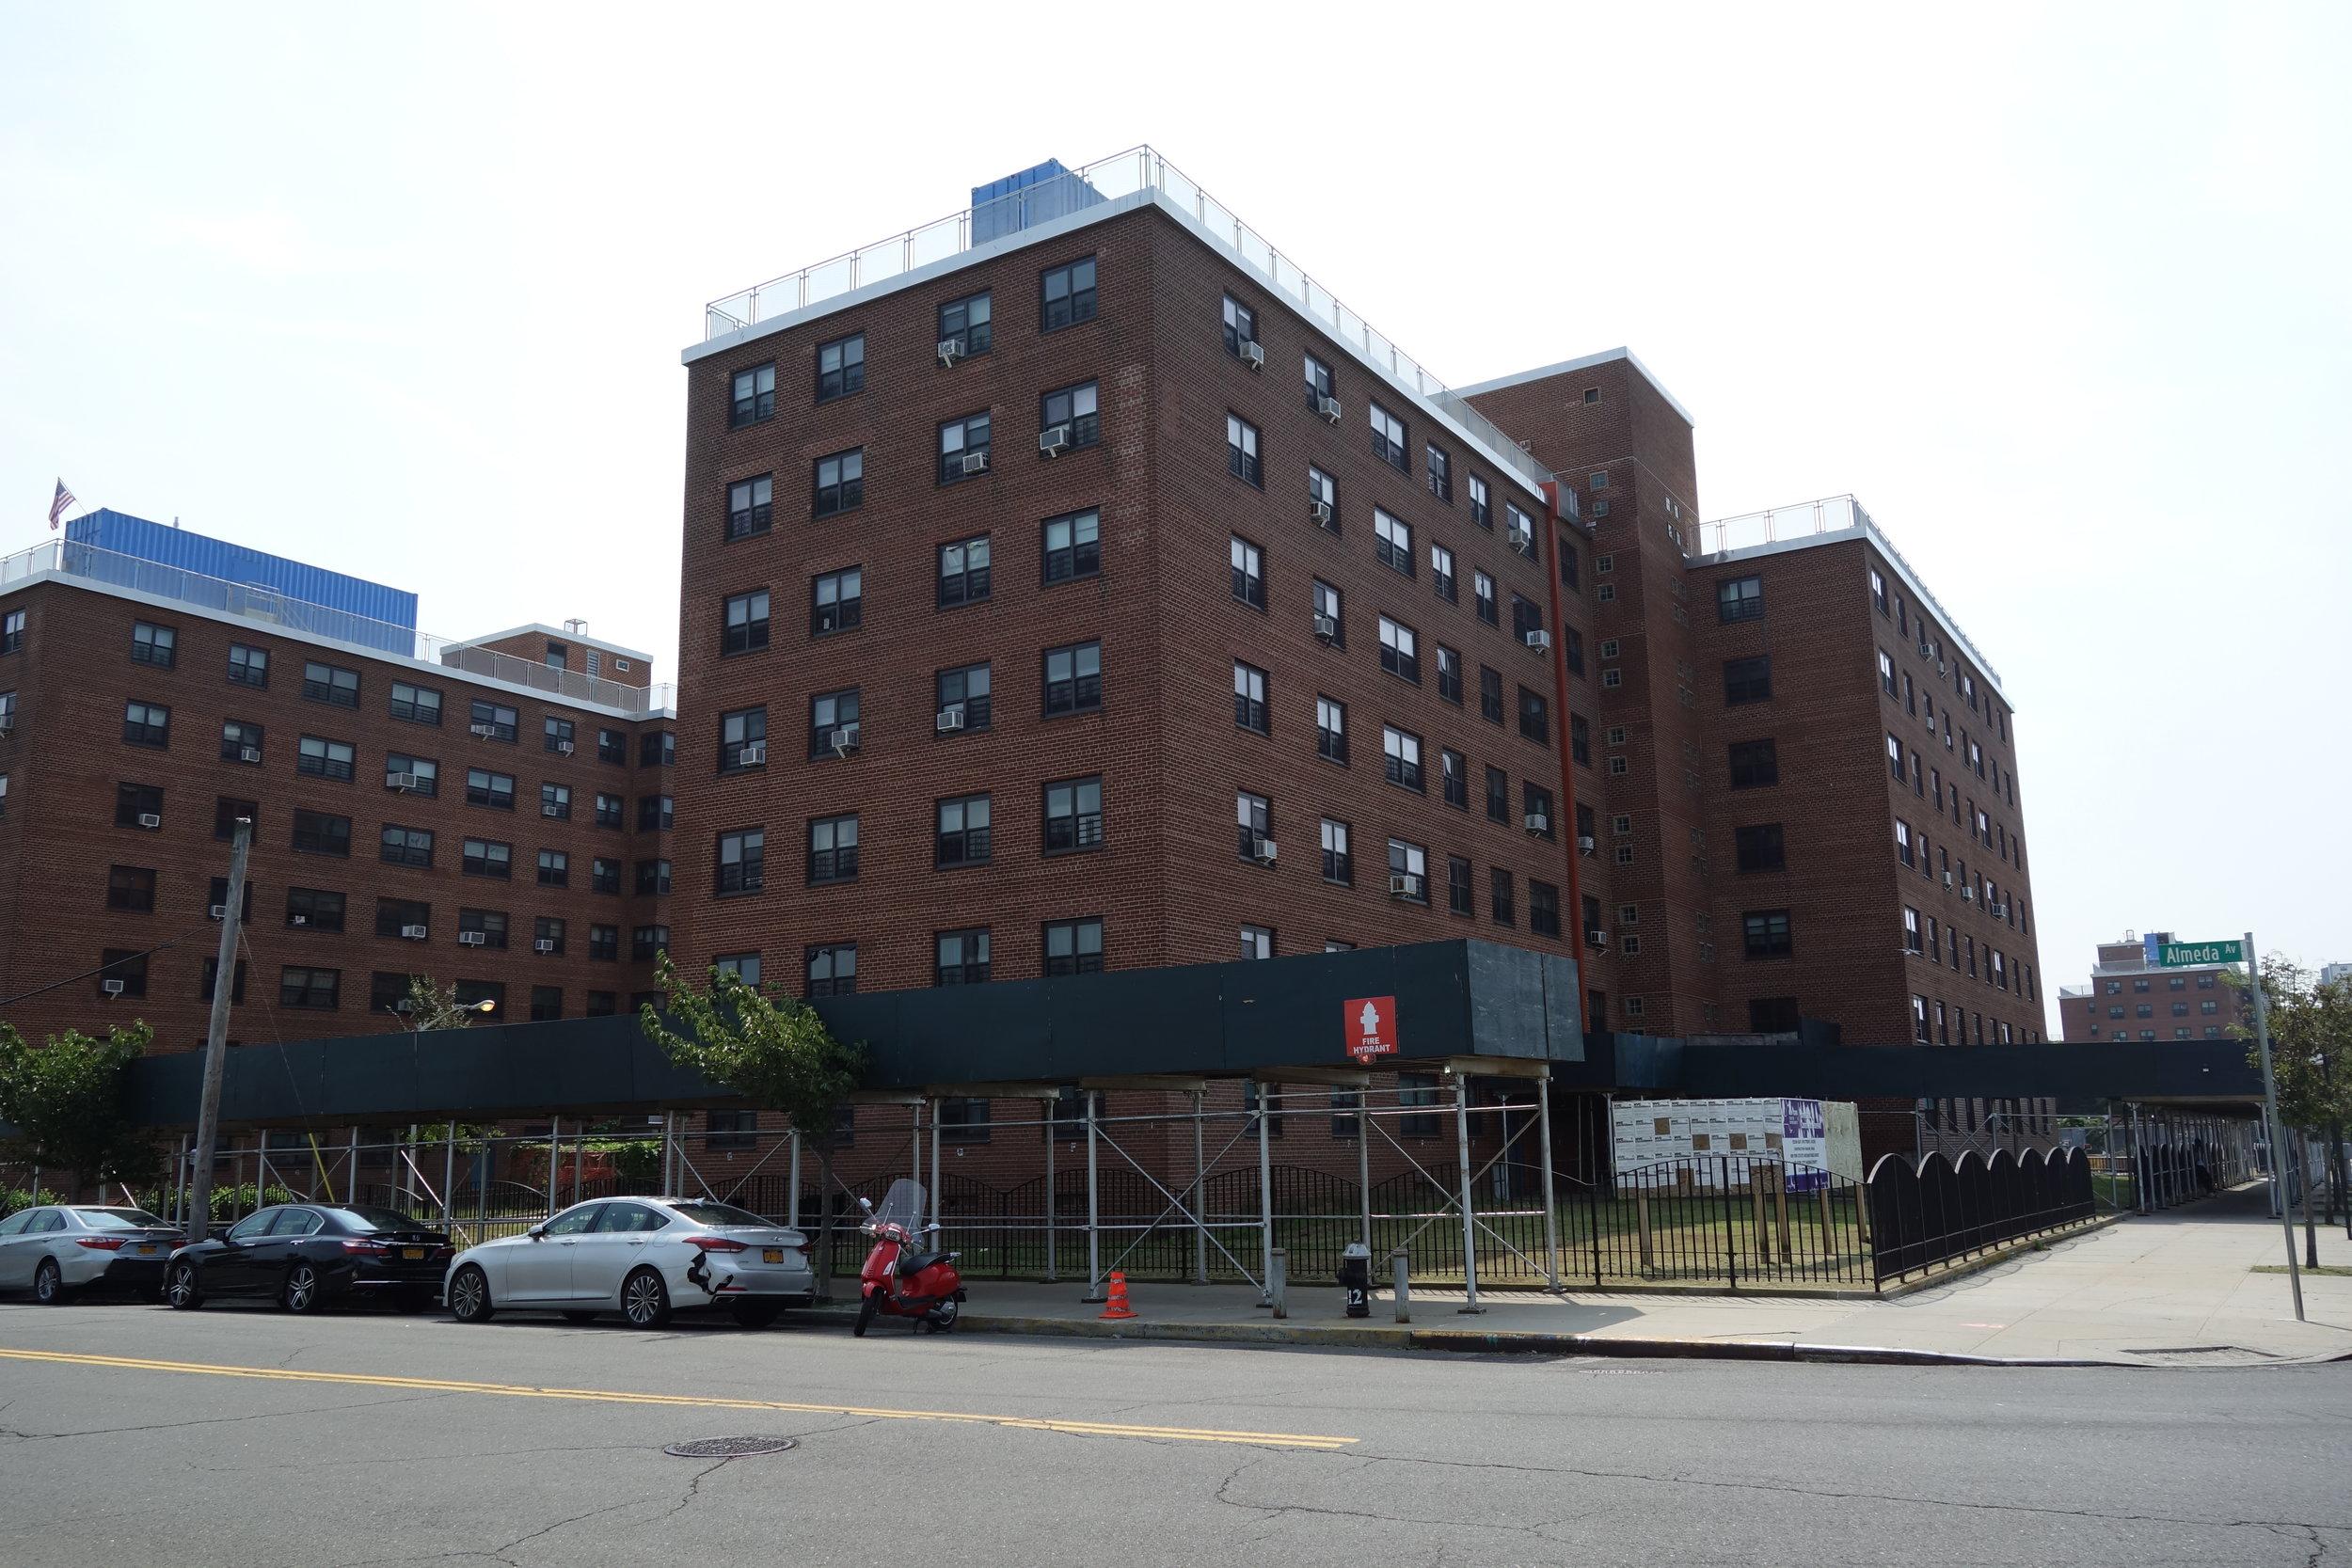 The Ocean Bay apartments in Far Rockaway. Photo via Wikimedia Commons/Tdorante10.